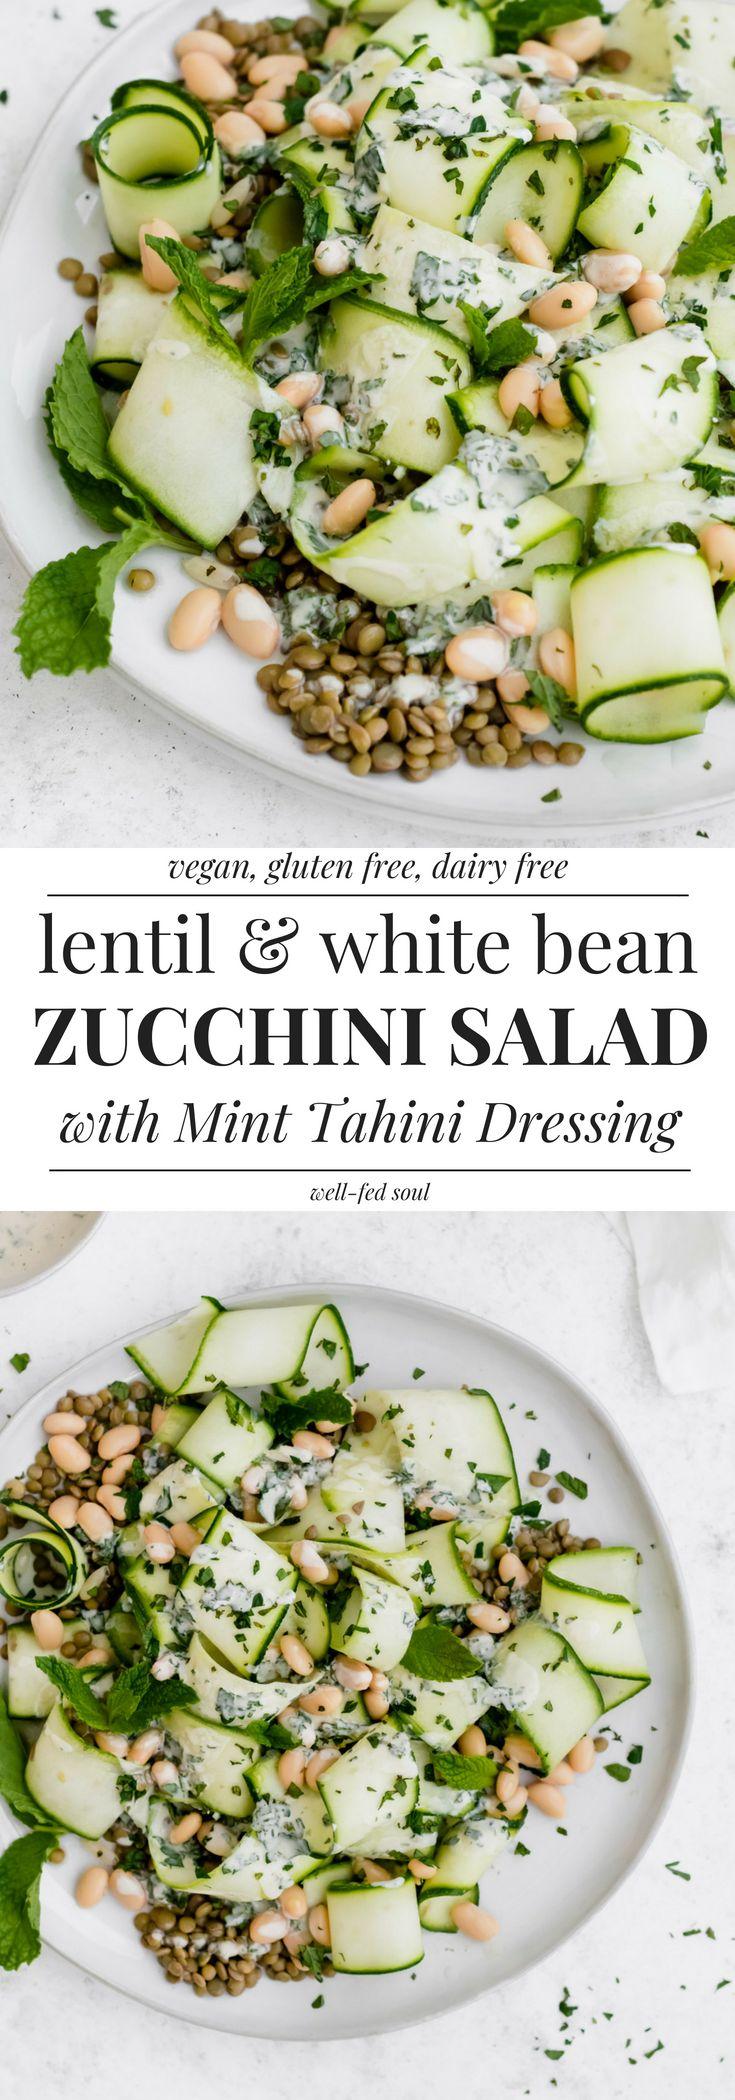 Lentil Zucchini Ribbon Salad with Mint Tahini & White Beans